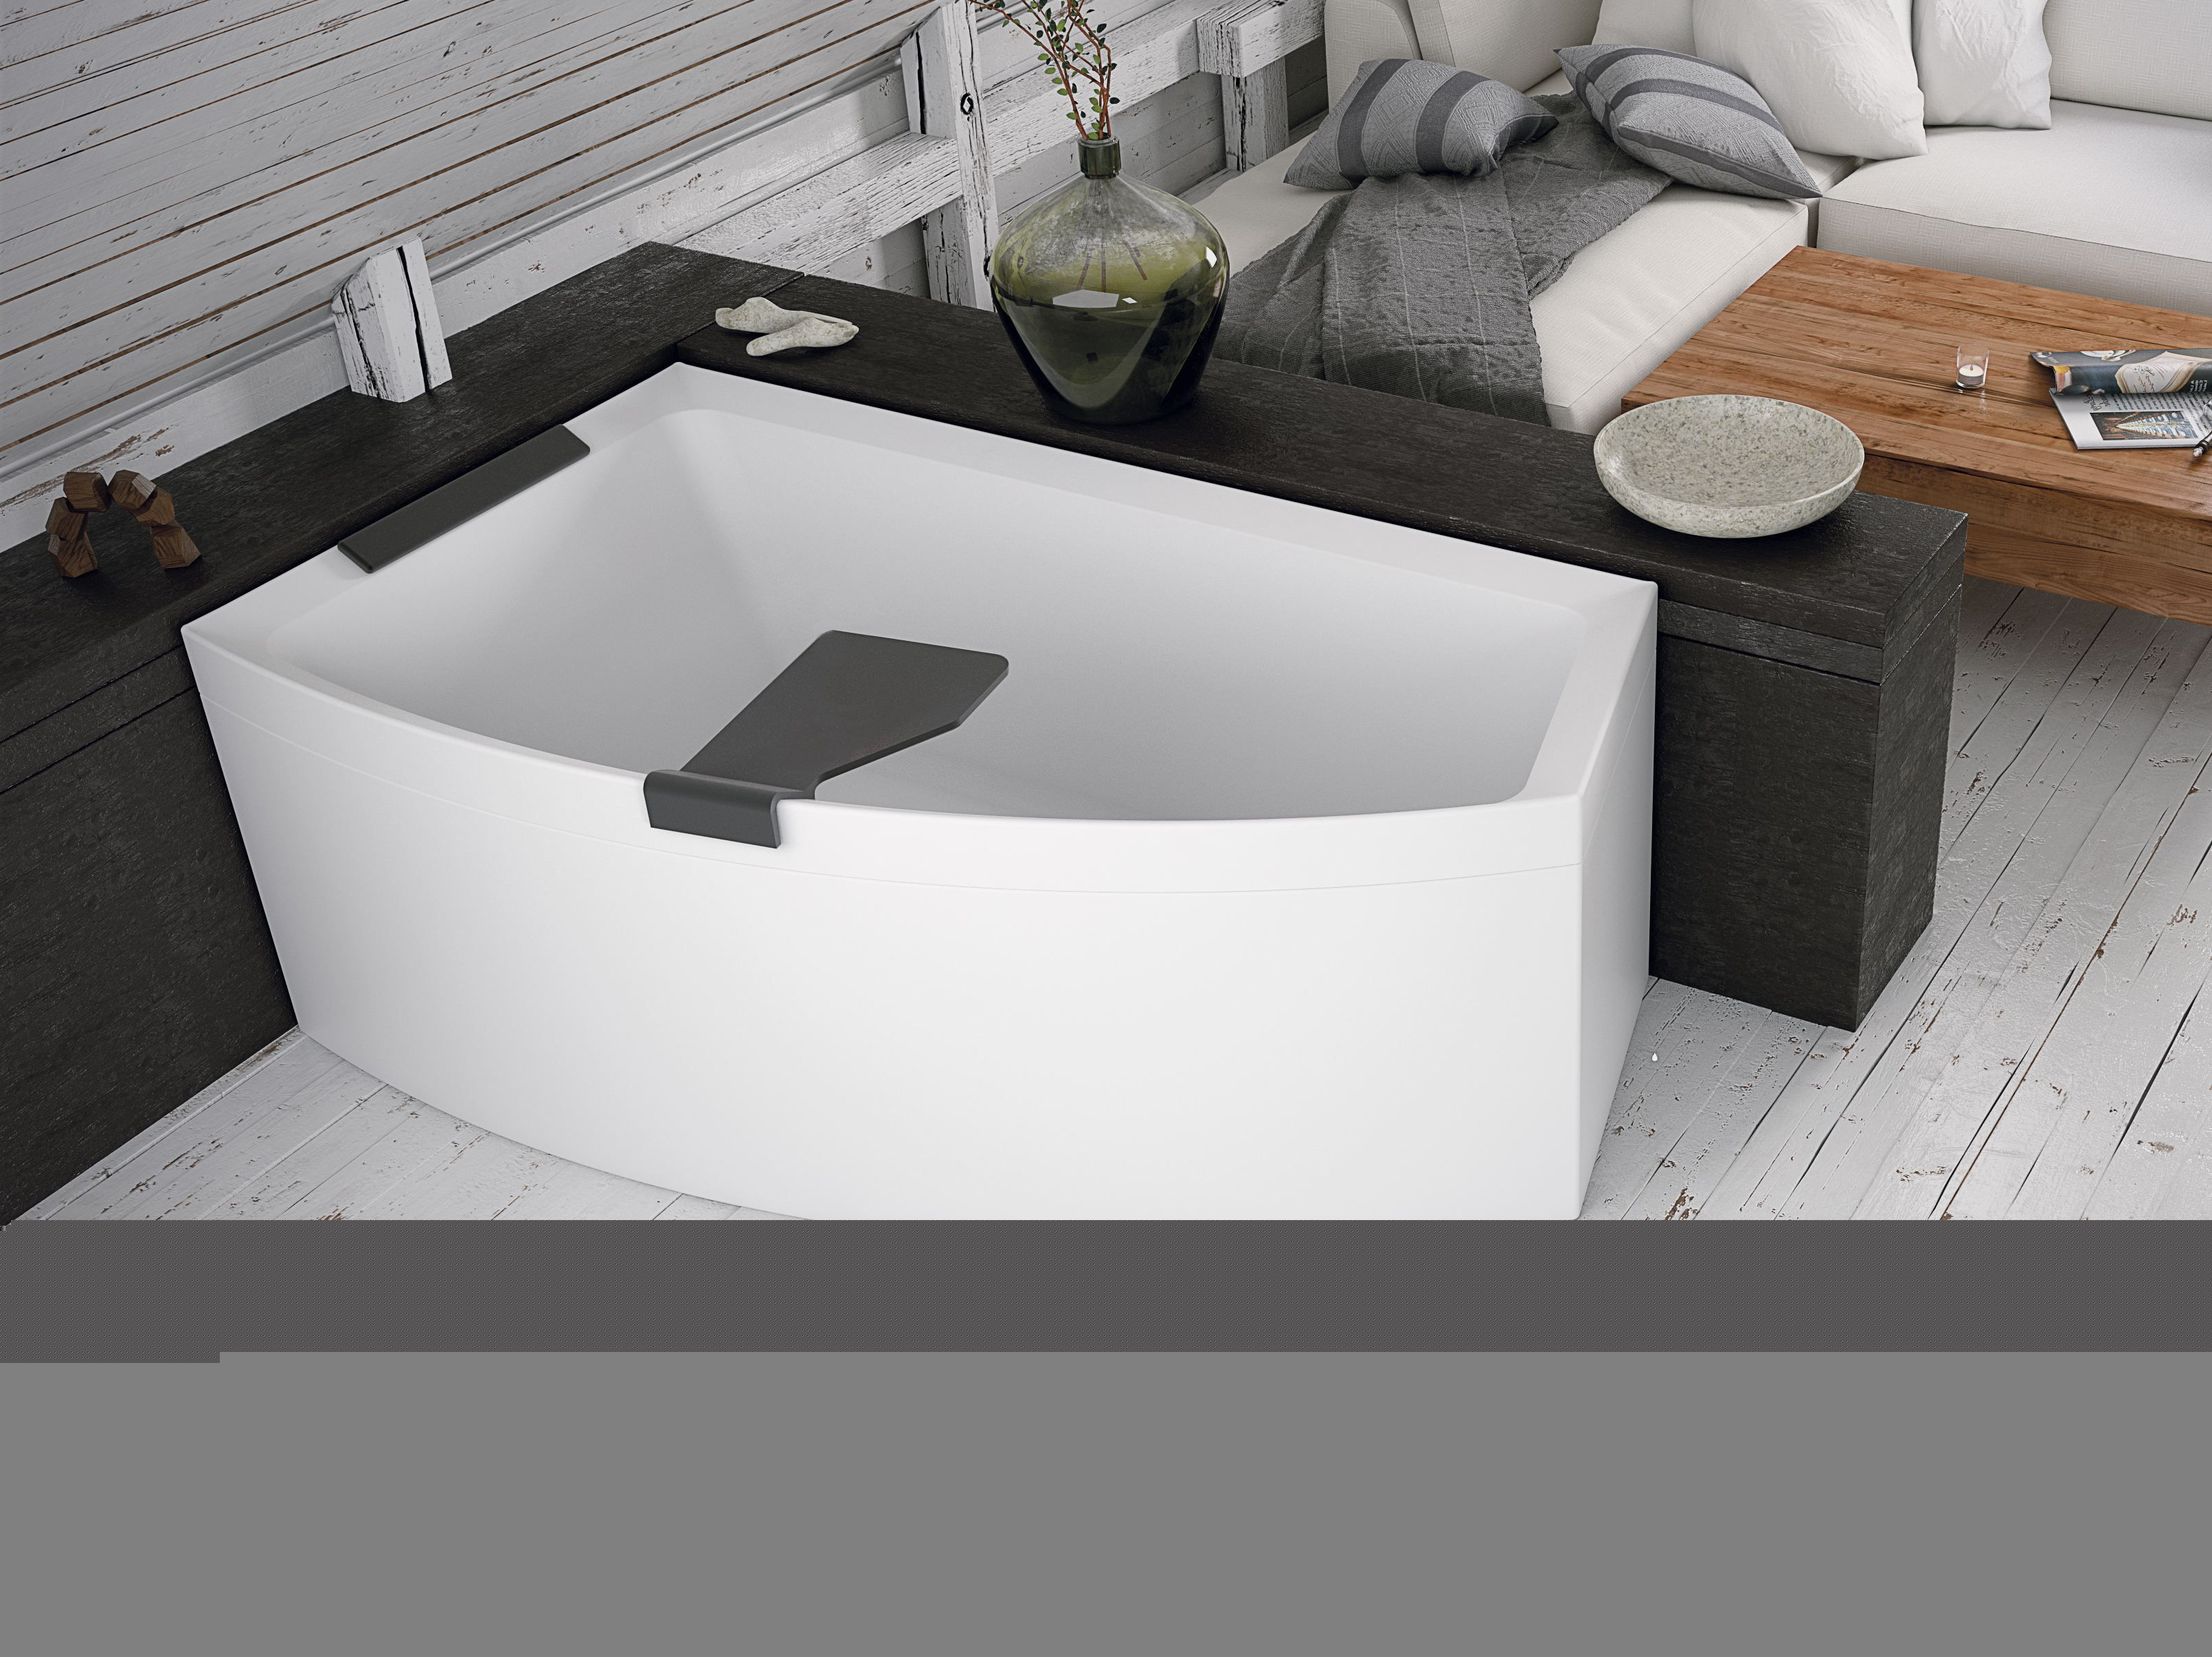 Poser Une Baignoire Avec Rebord la baignoire d'angle divina o de novellini avec les angles